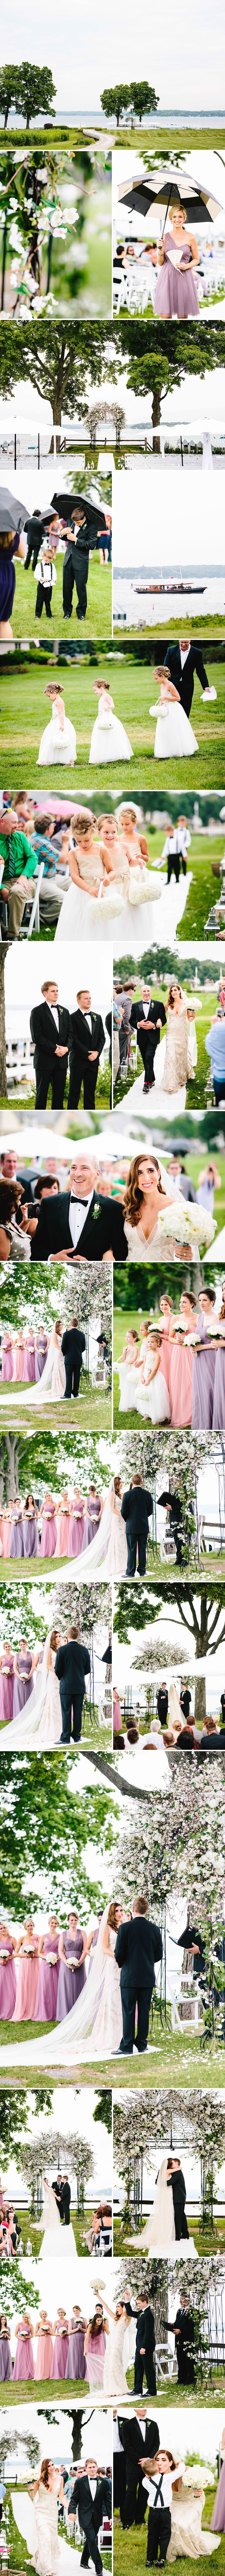 chicago-fine-art-wedding-photography-owens2